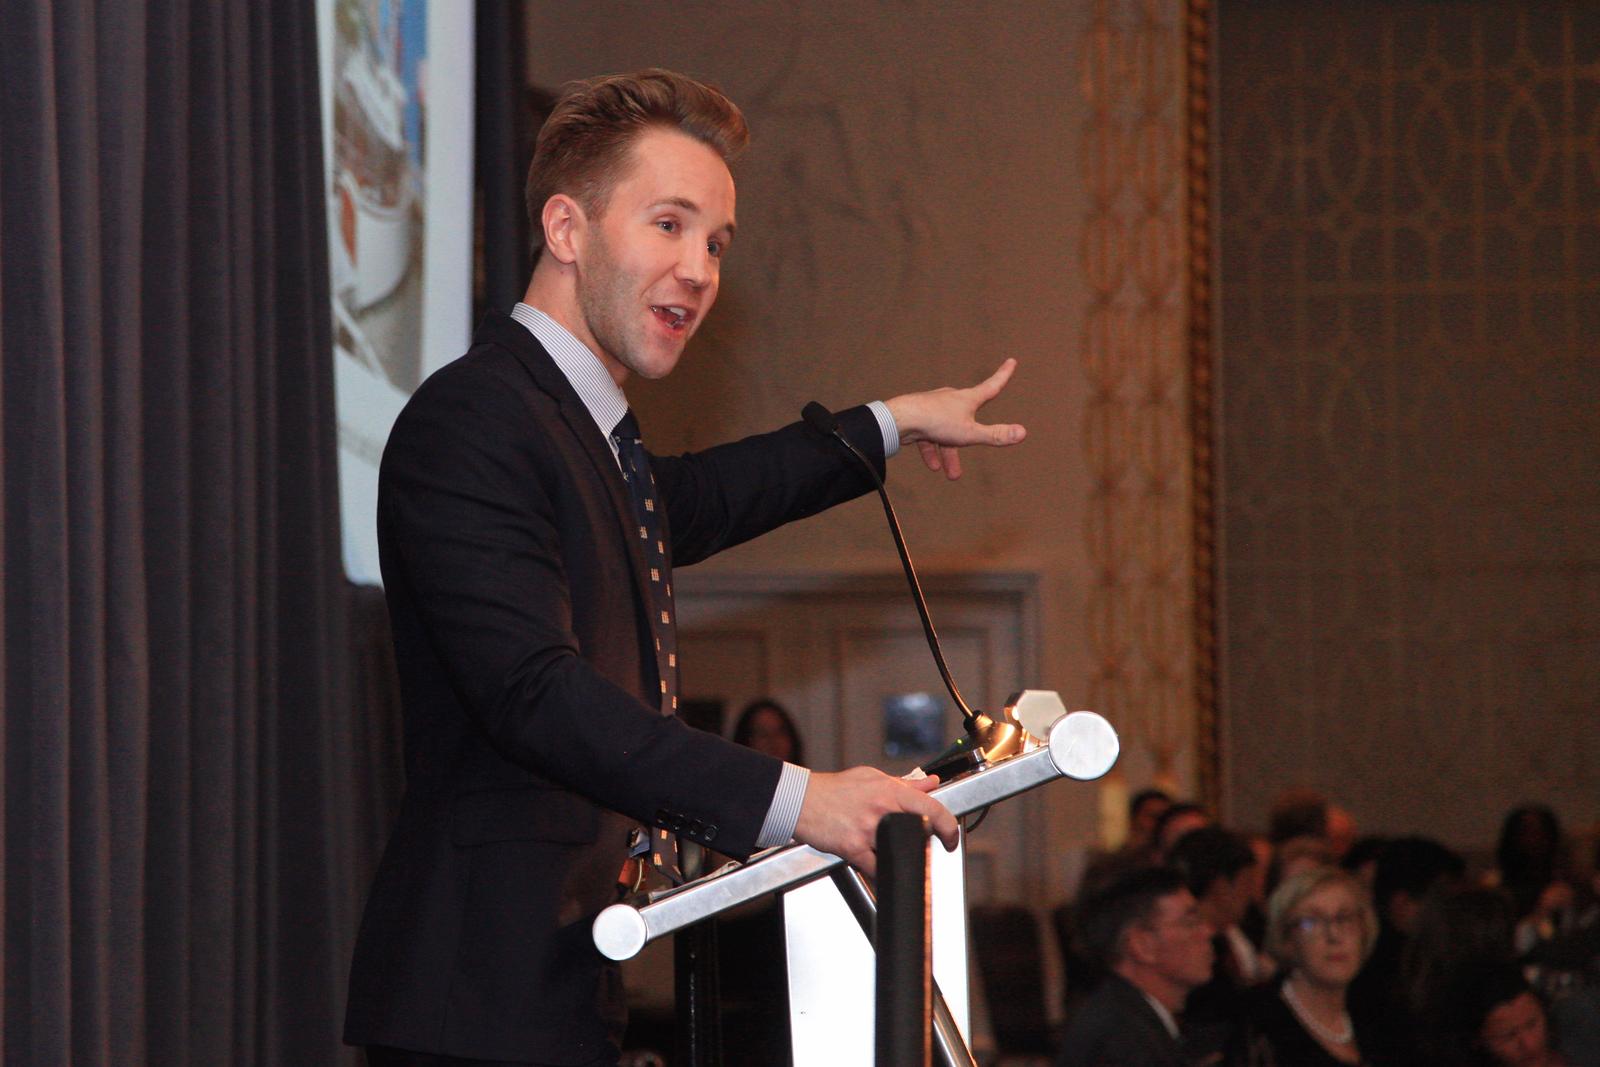 Christie's Auctioneer Robbie Gordy